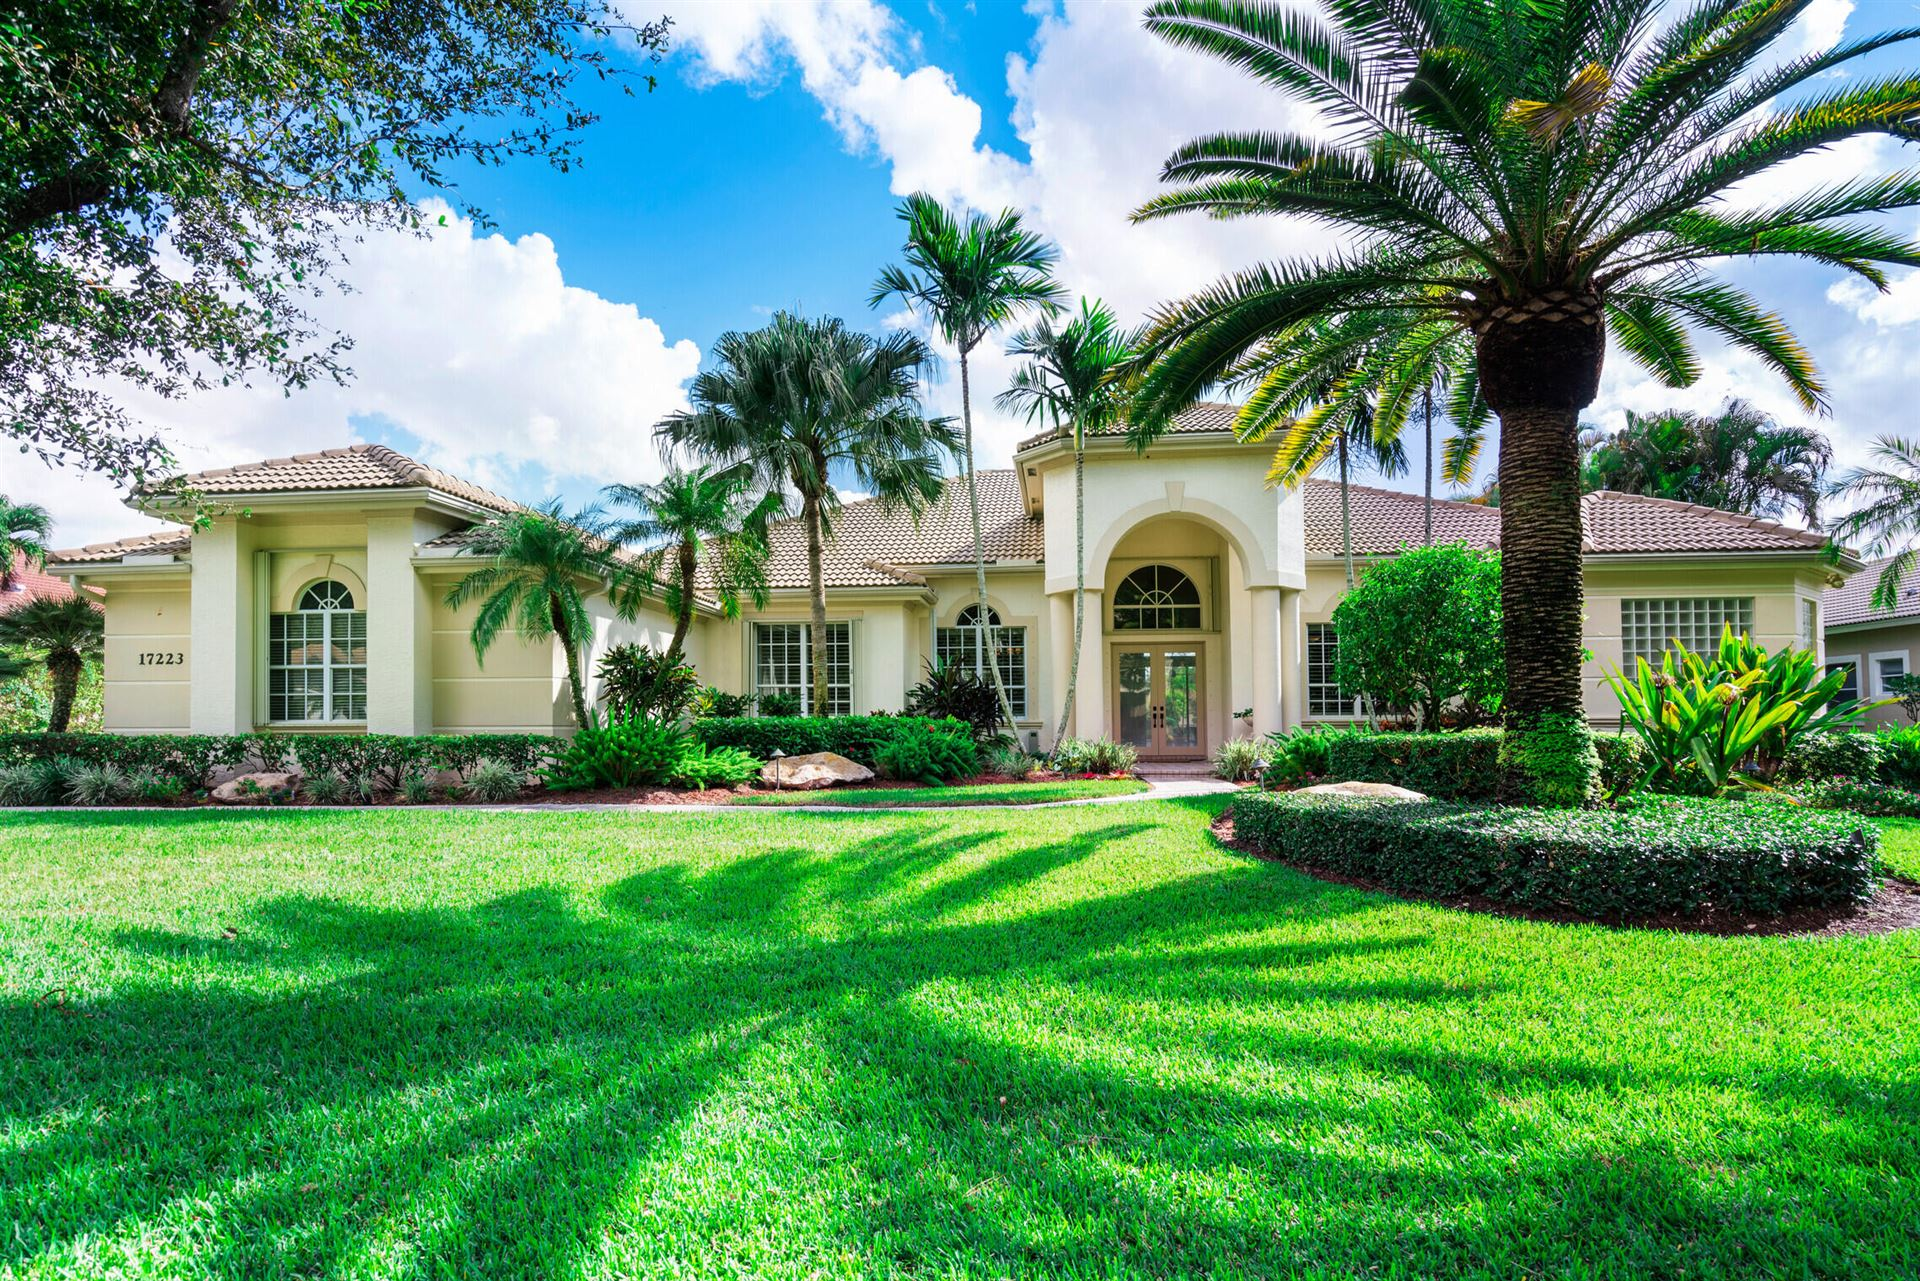 17223 Gulf Pine Circle, Wellington, FL 33414 - MLS#: RX-10752074